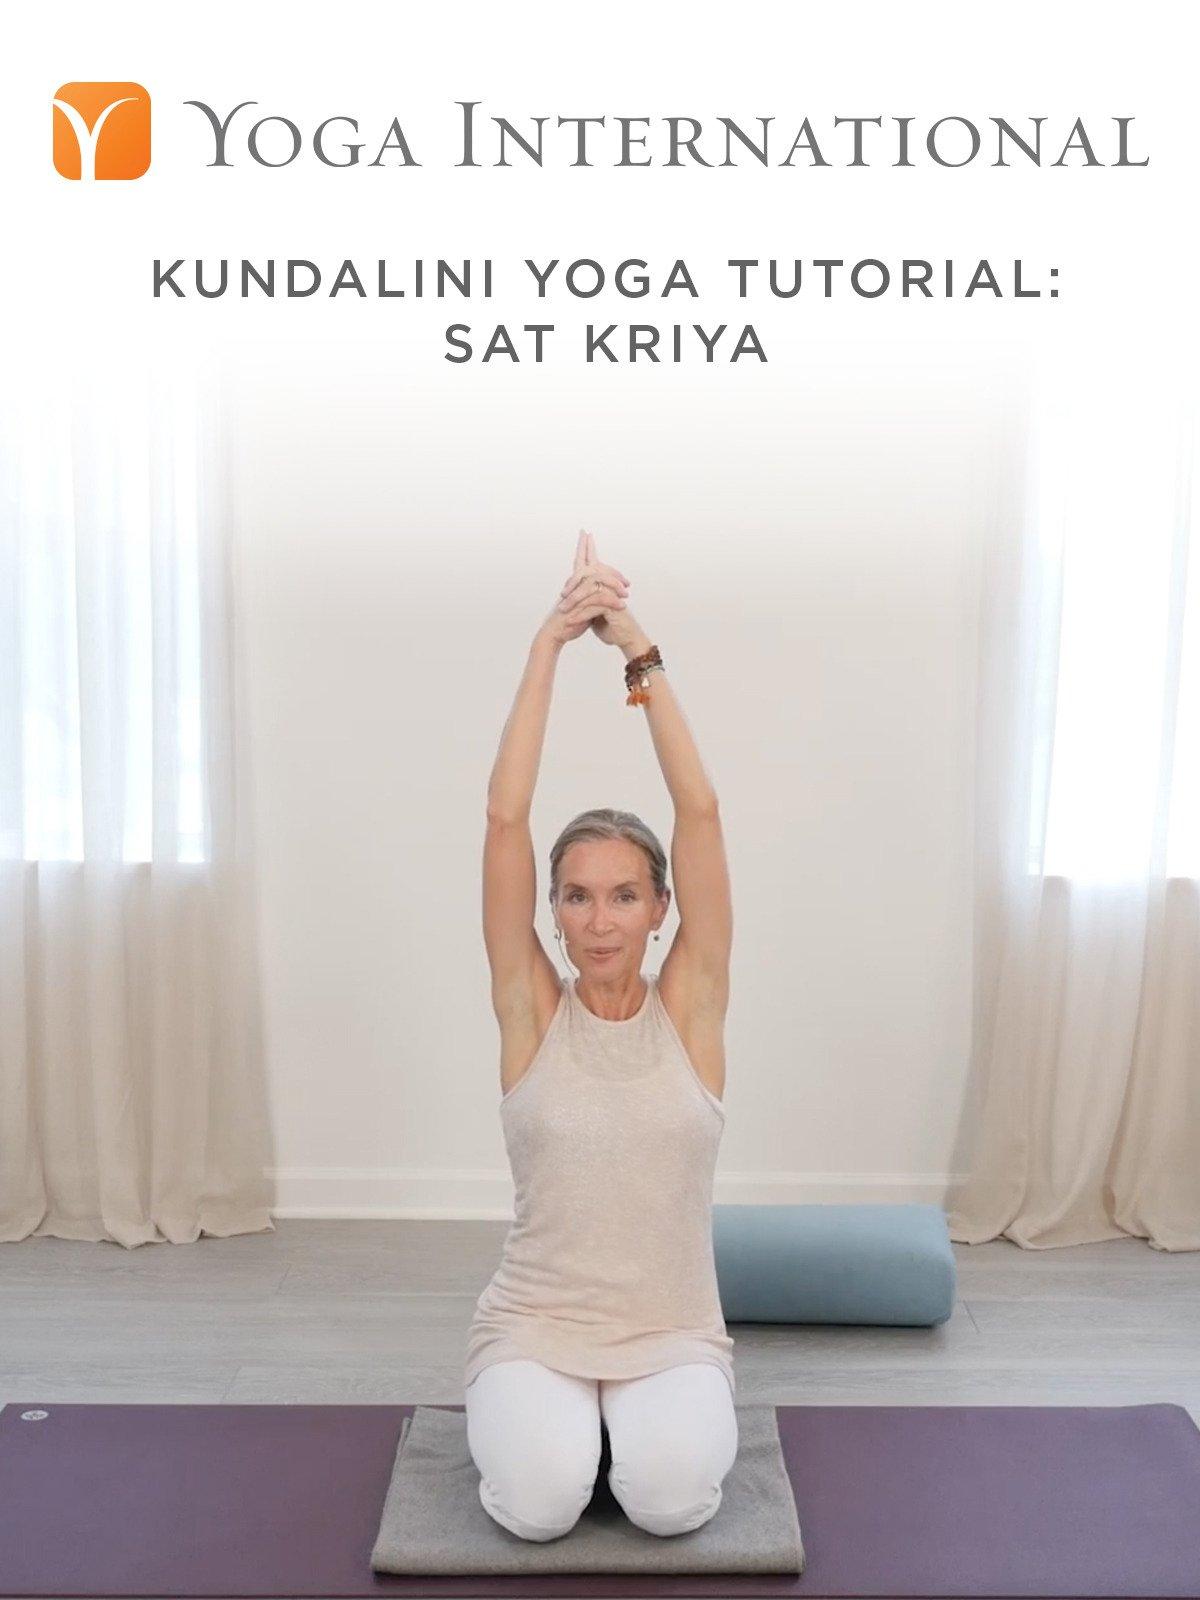 Amazon com: Watch Kundalini Yoga Tutorial: Sat Kriya | Prime Video